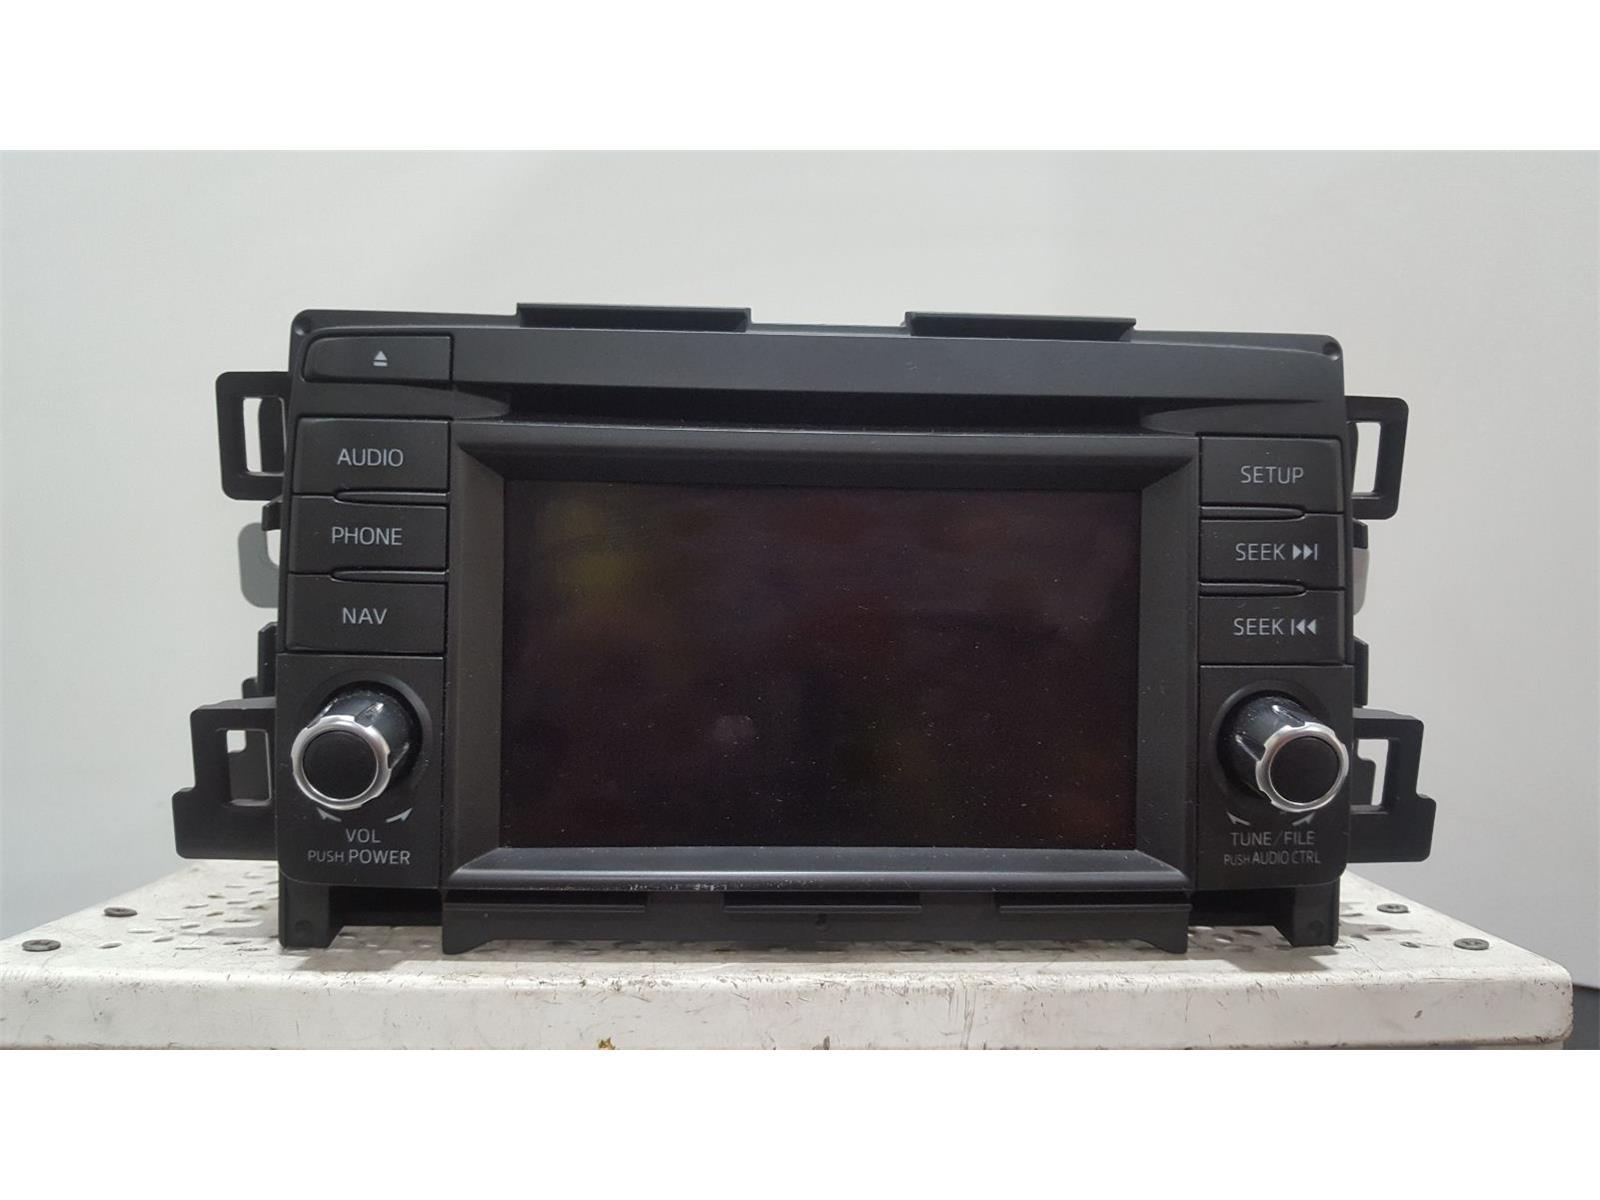 MAZDA CX-5 - MK1 (KE) 2012 TO 2016 - CD Player Stereo Headunit KD4766DV0B